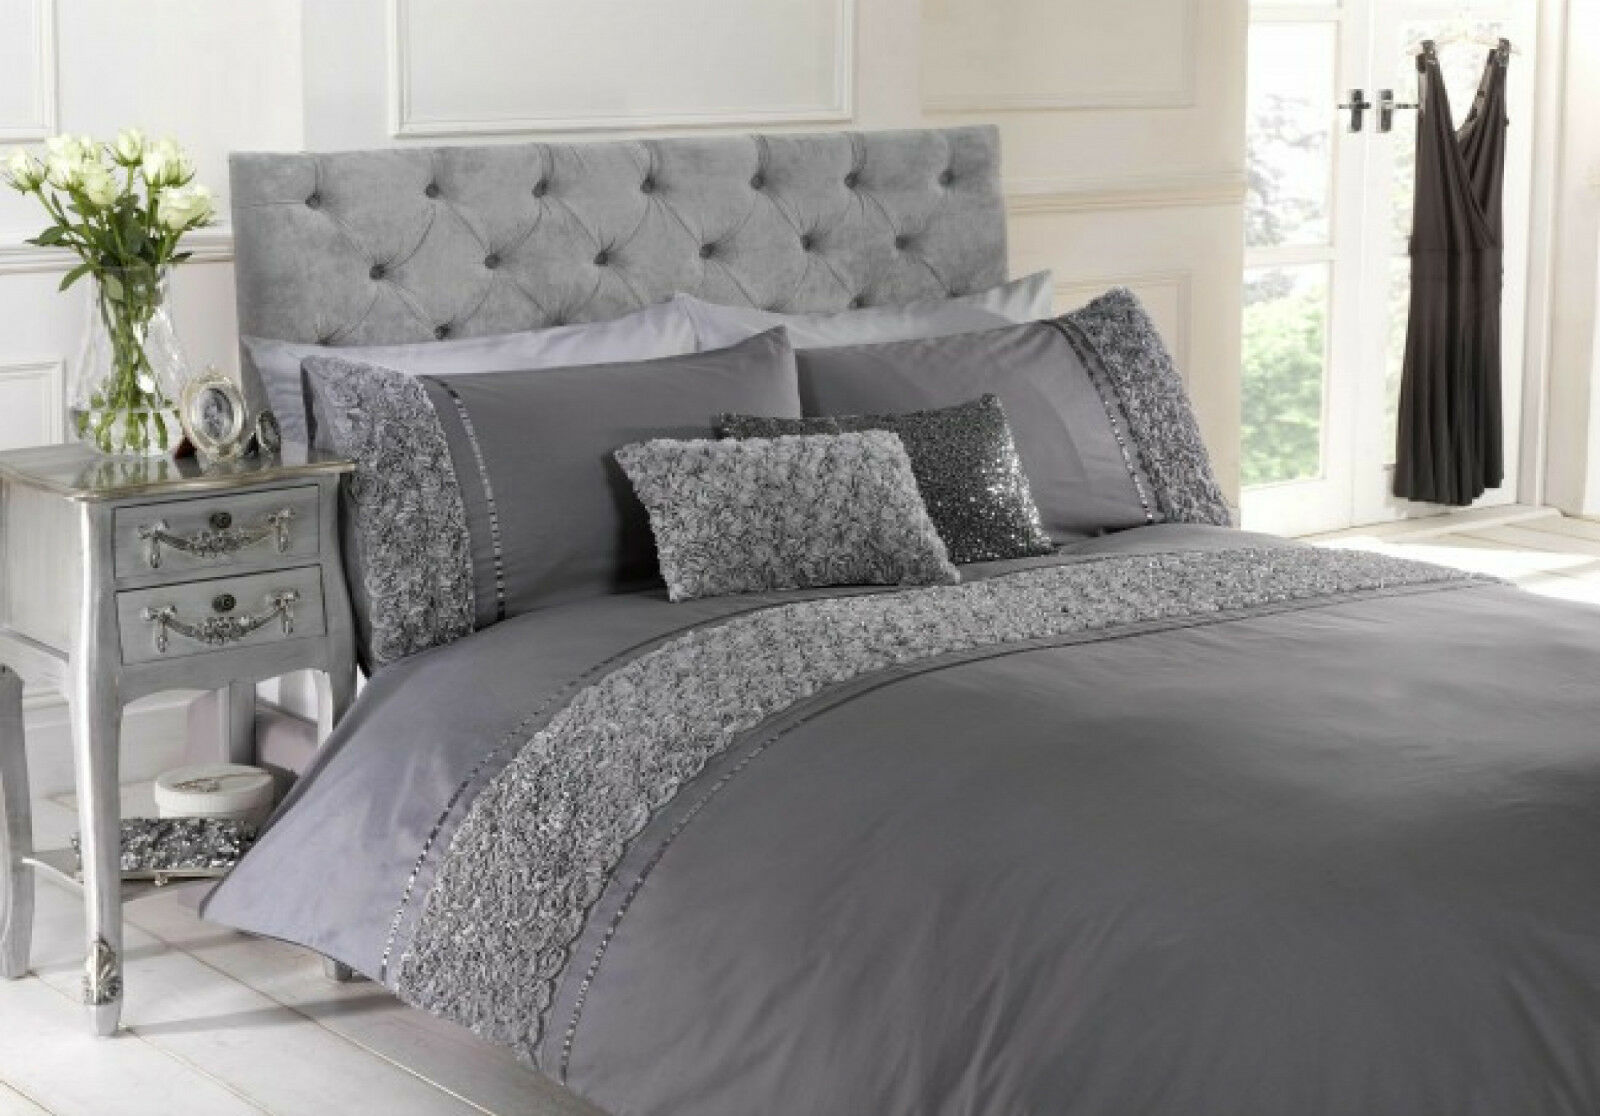 Duvet Quilt Cover Bedding Set & Pillowcases Stylish Luxury Embellished Grey pink